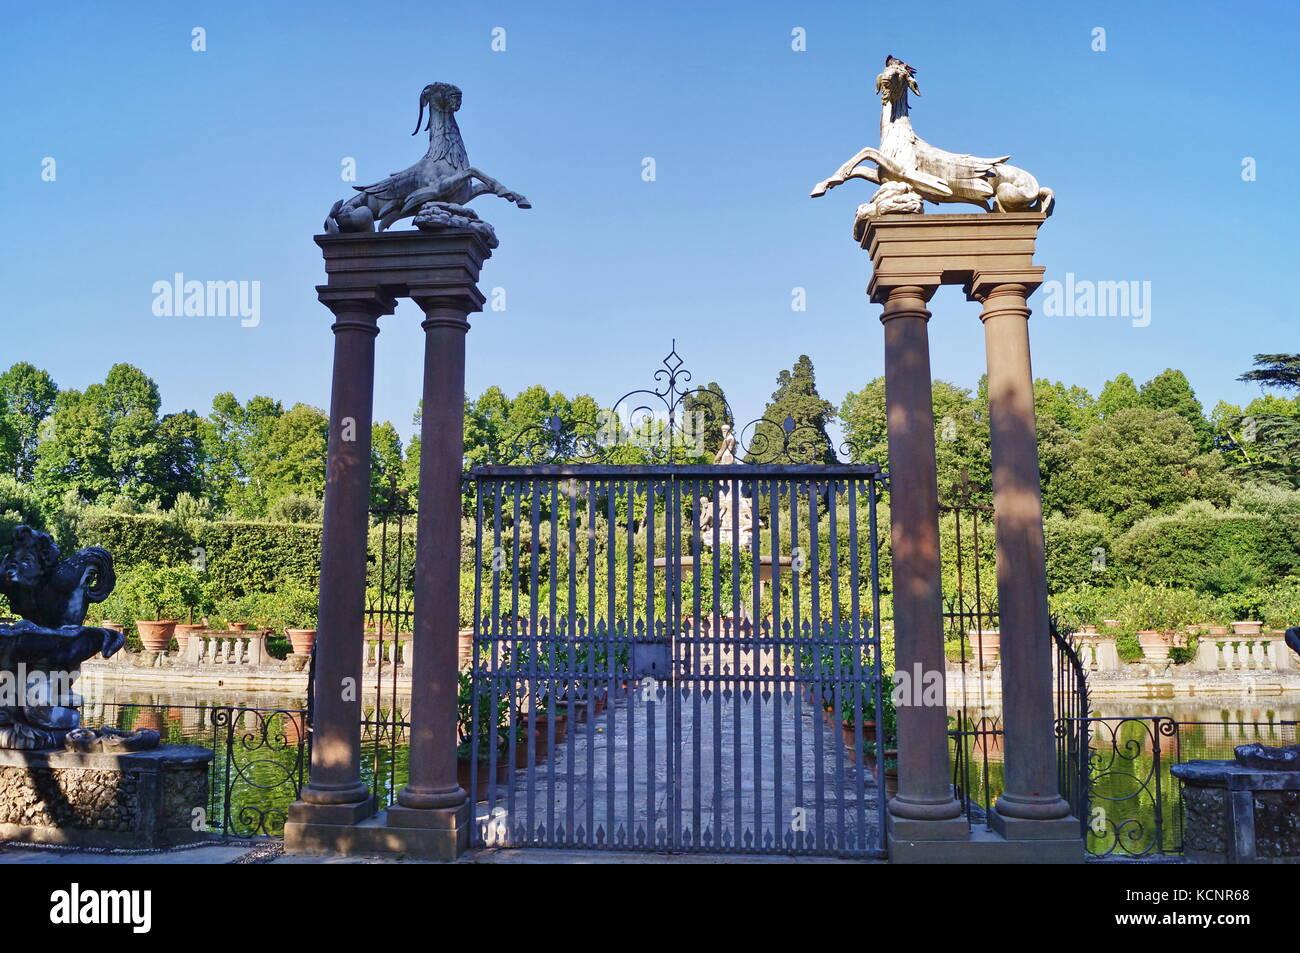 Gate with capricorns and harpys in Island Fountain Boboli Gardens Florence Tuscany Italy. Stock Photo